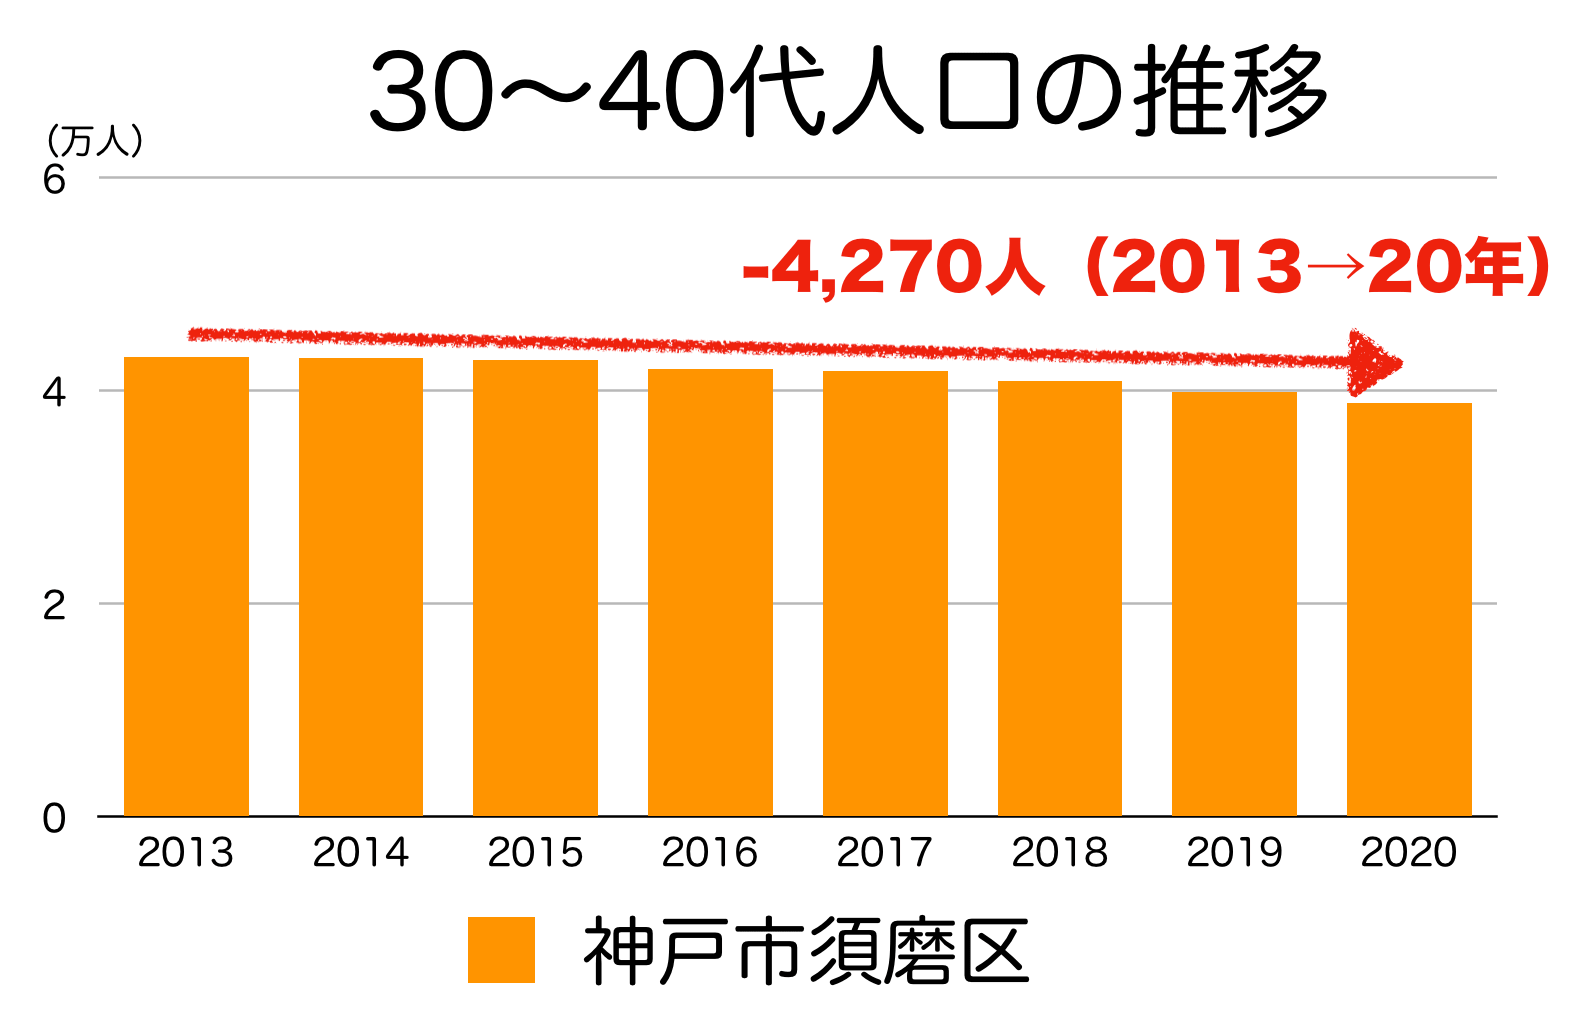 神戸市須磨区の30〜40代人口の推移